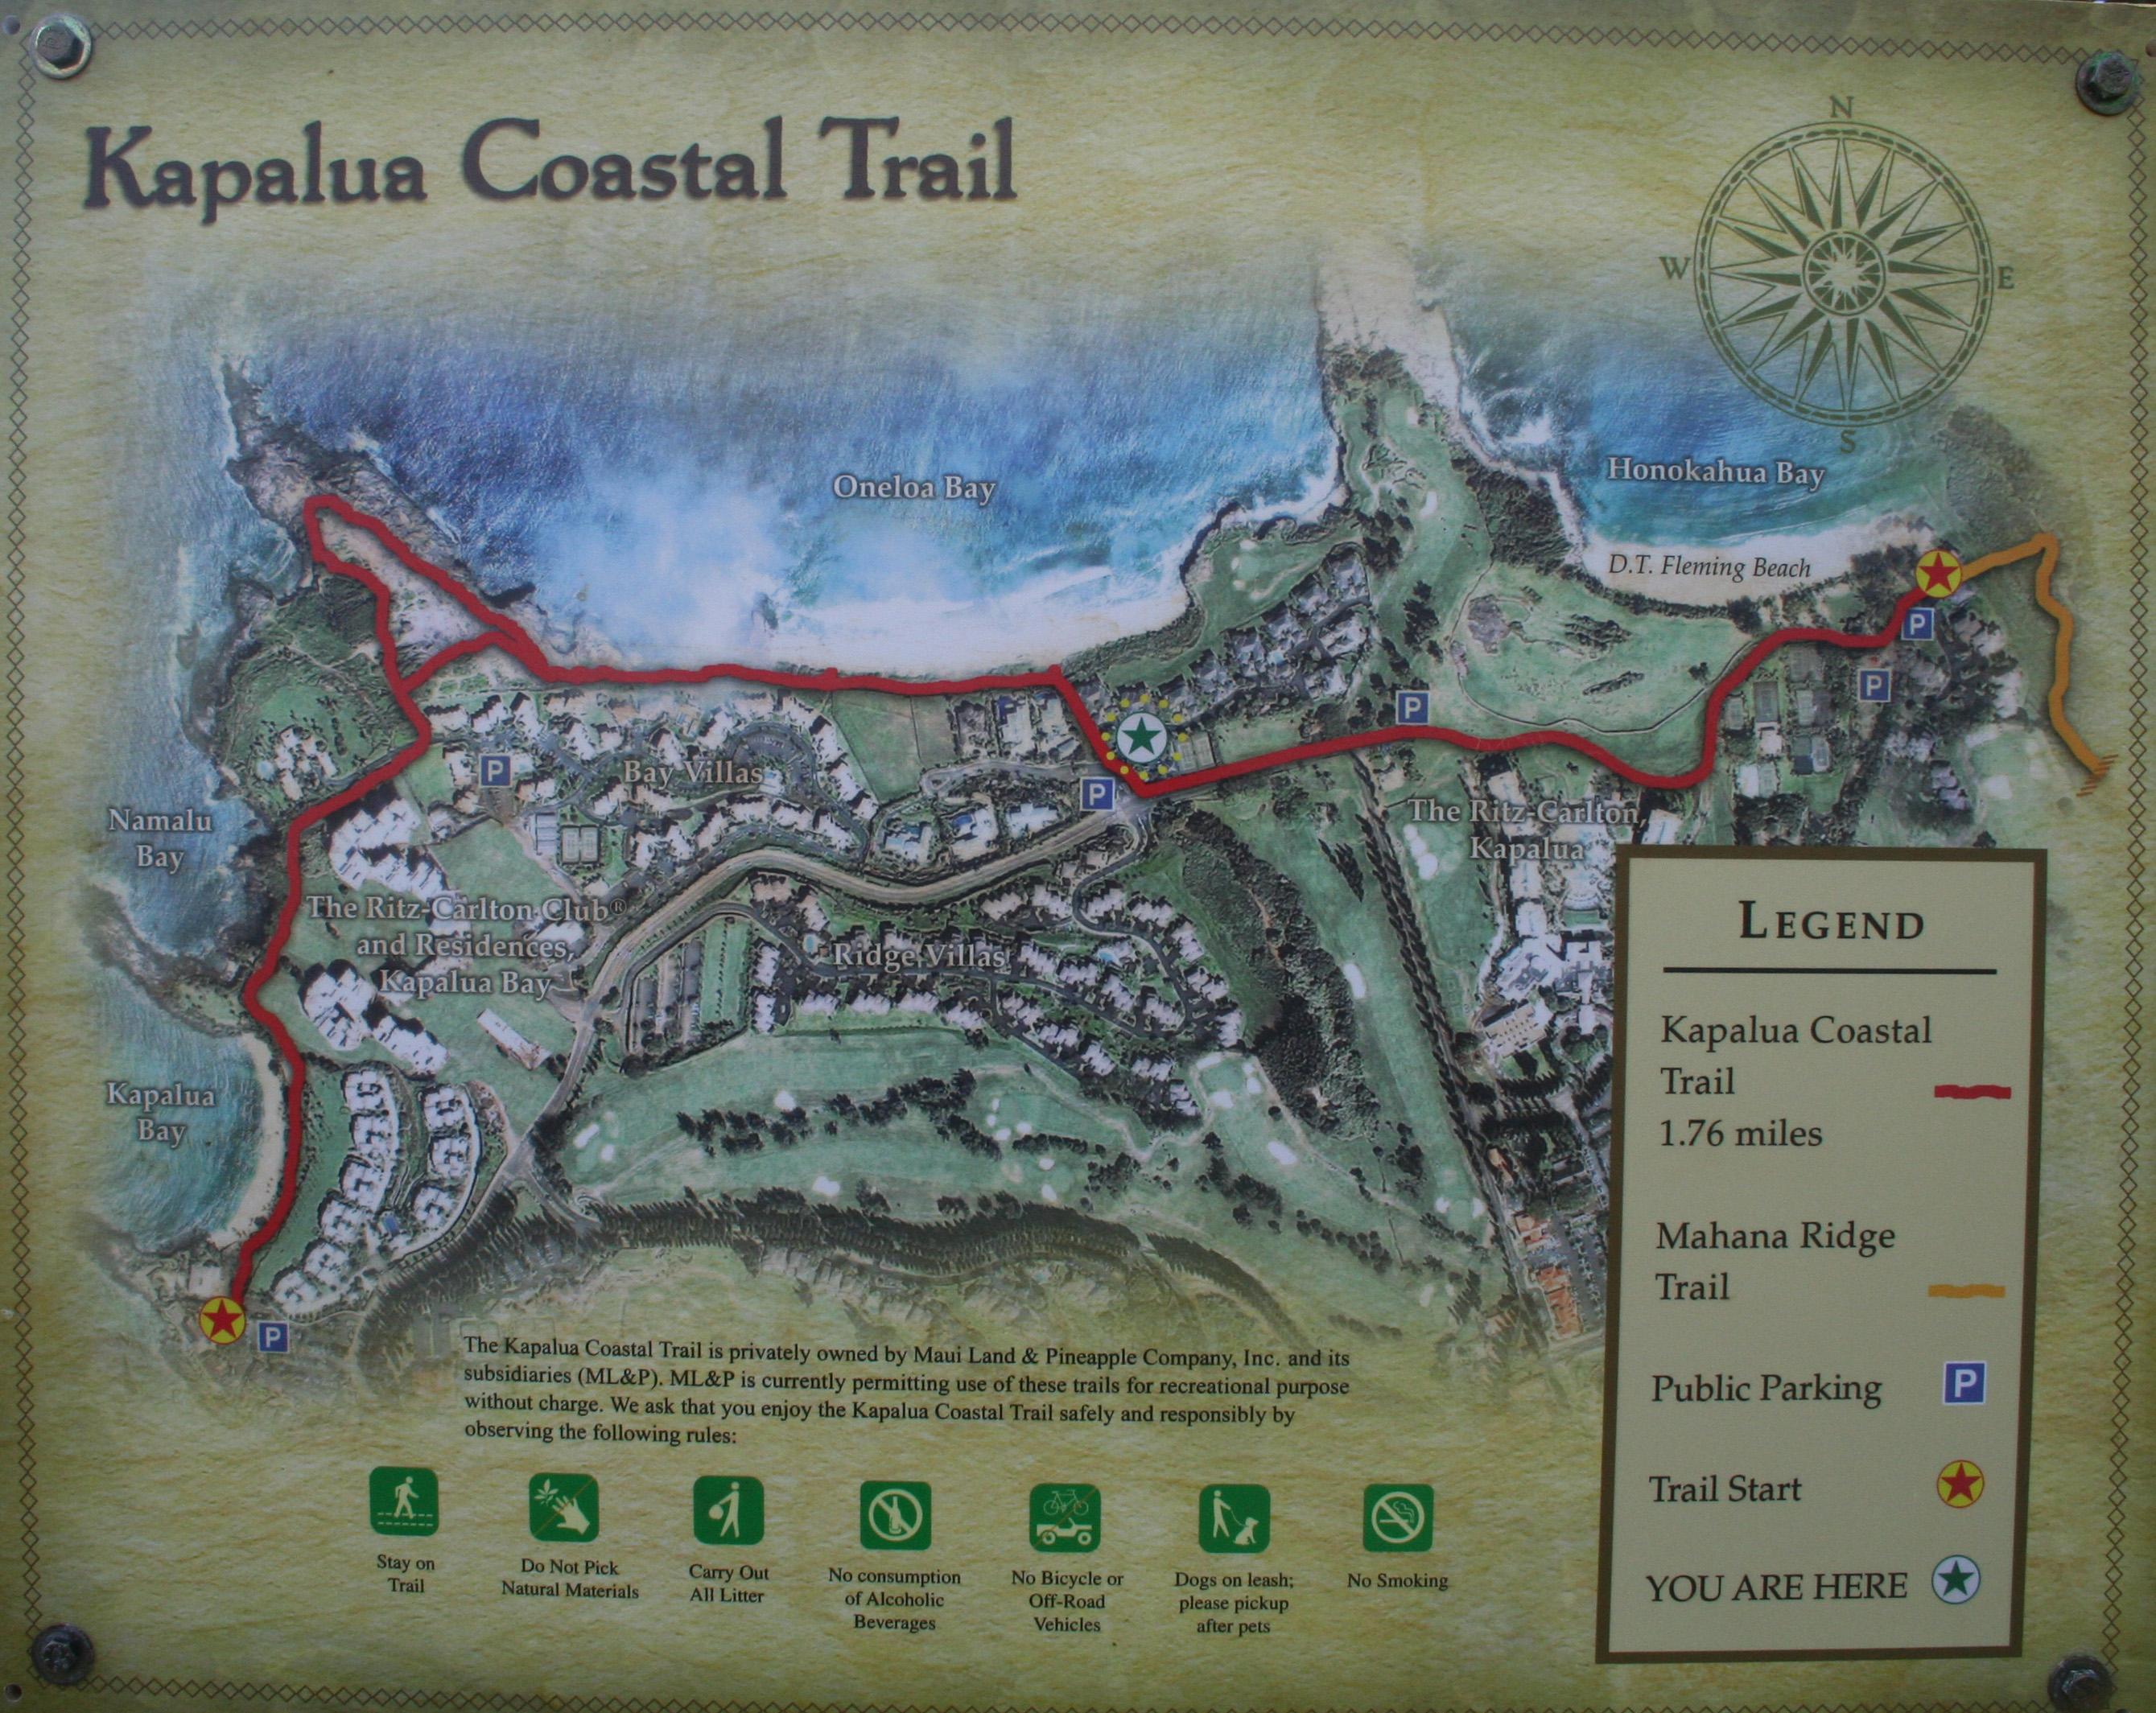 Kapalua Hawaii Map.Oneloa Beach Maui Guidebook